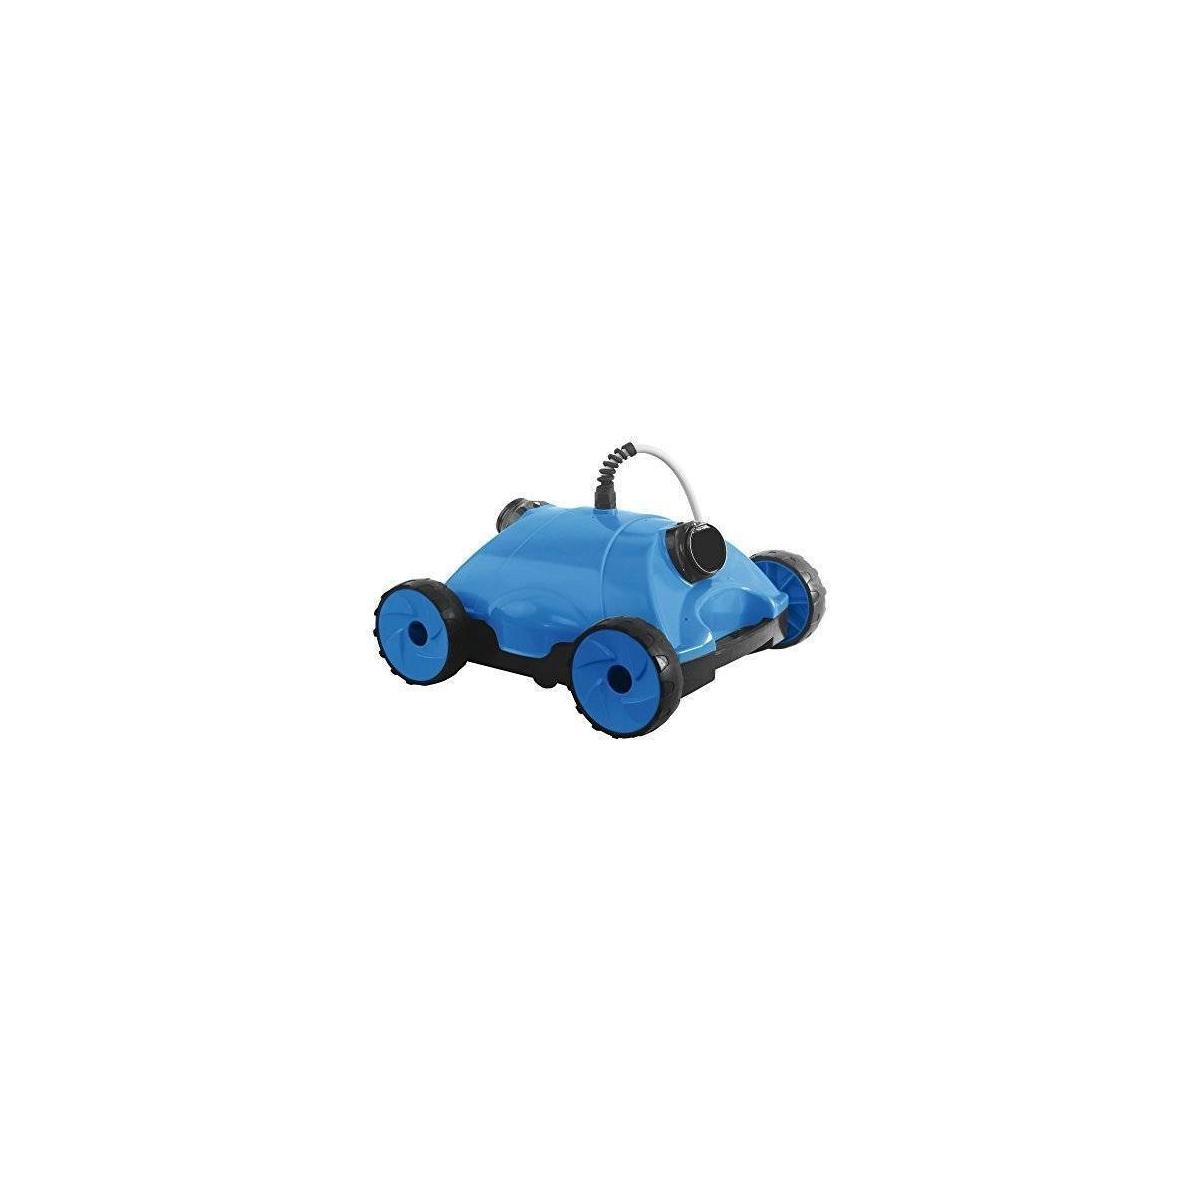 Limpiafondos electrico Bluek